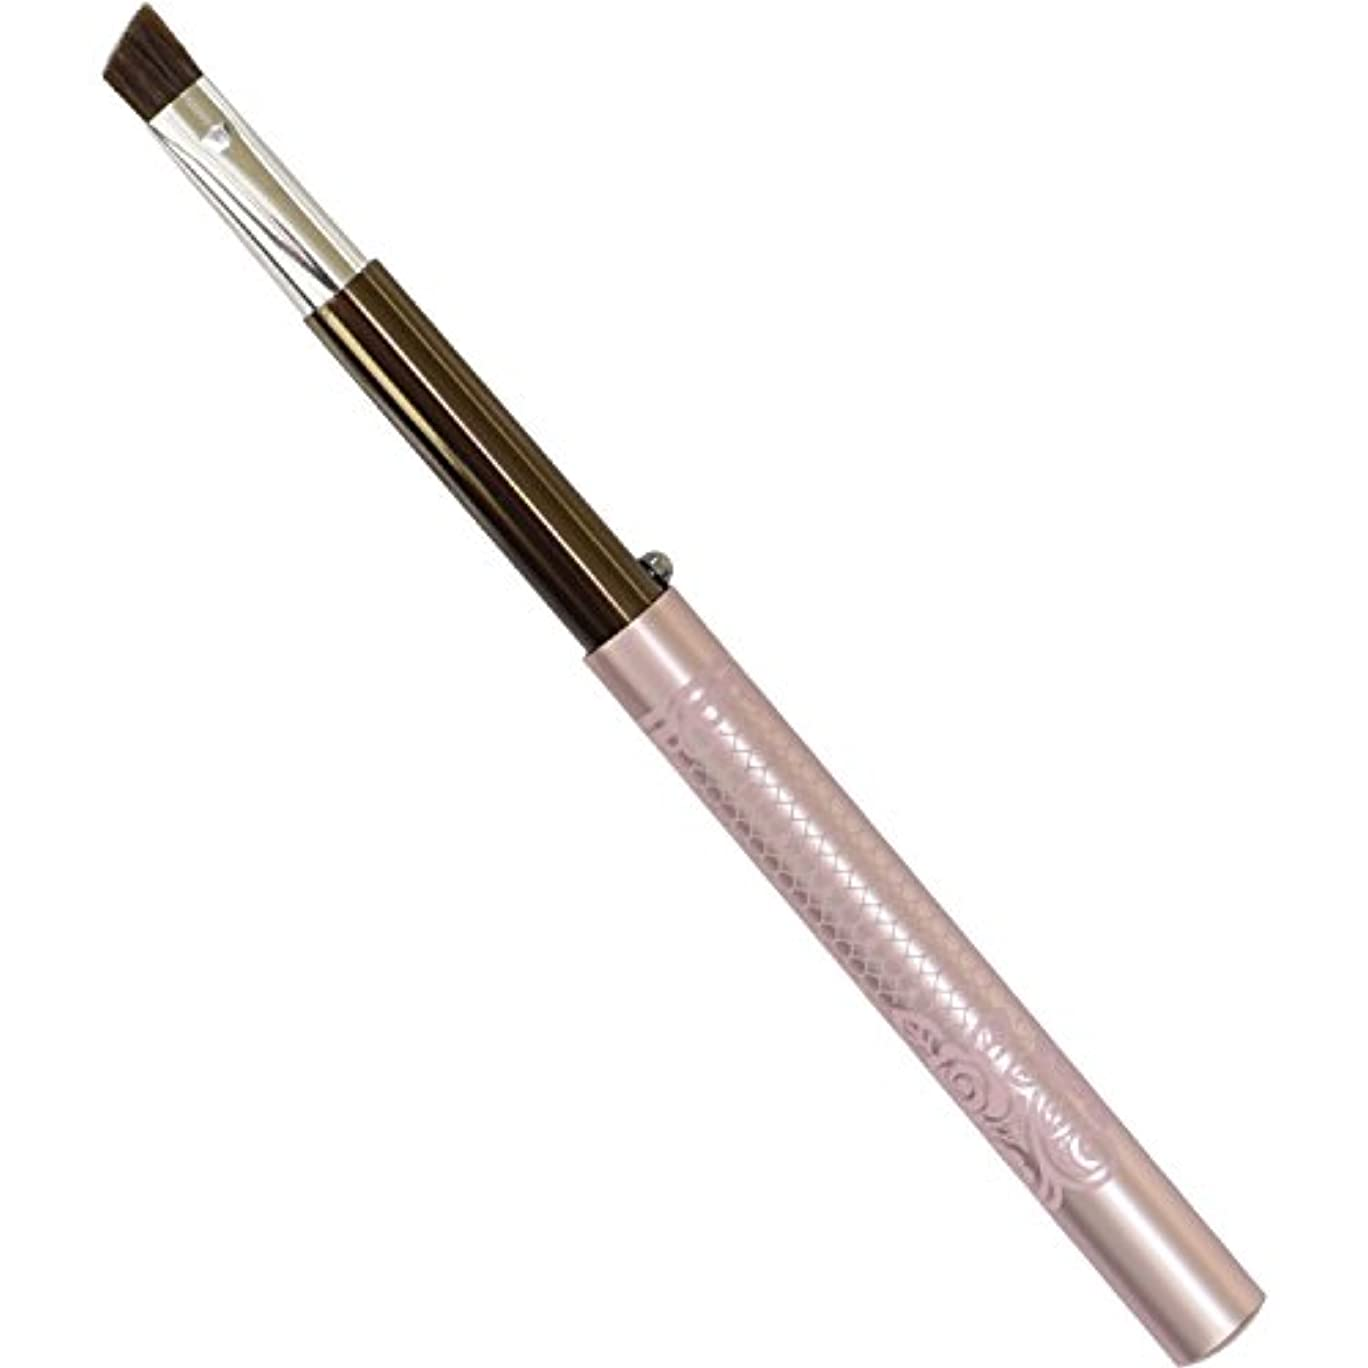 RO-4 六角館さくら堂 ロジェ アイブローブラシ ブラウン×ピンクのレース柄がかわいい! 携帯用メイクブラシ